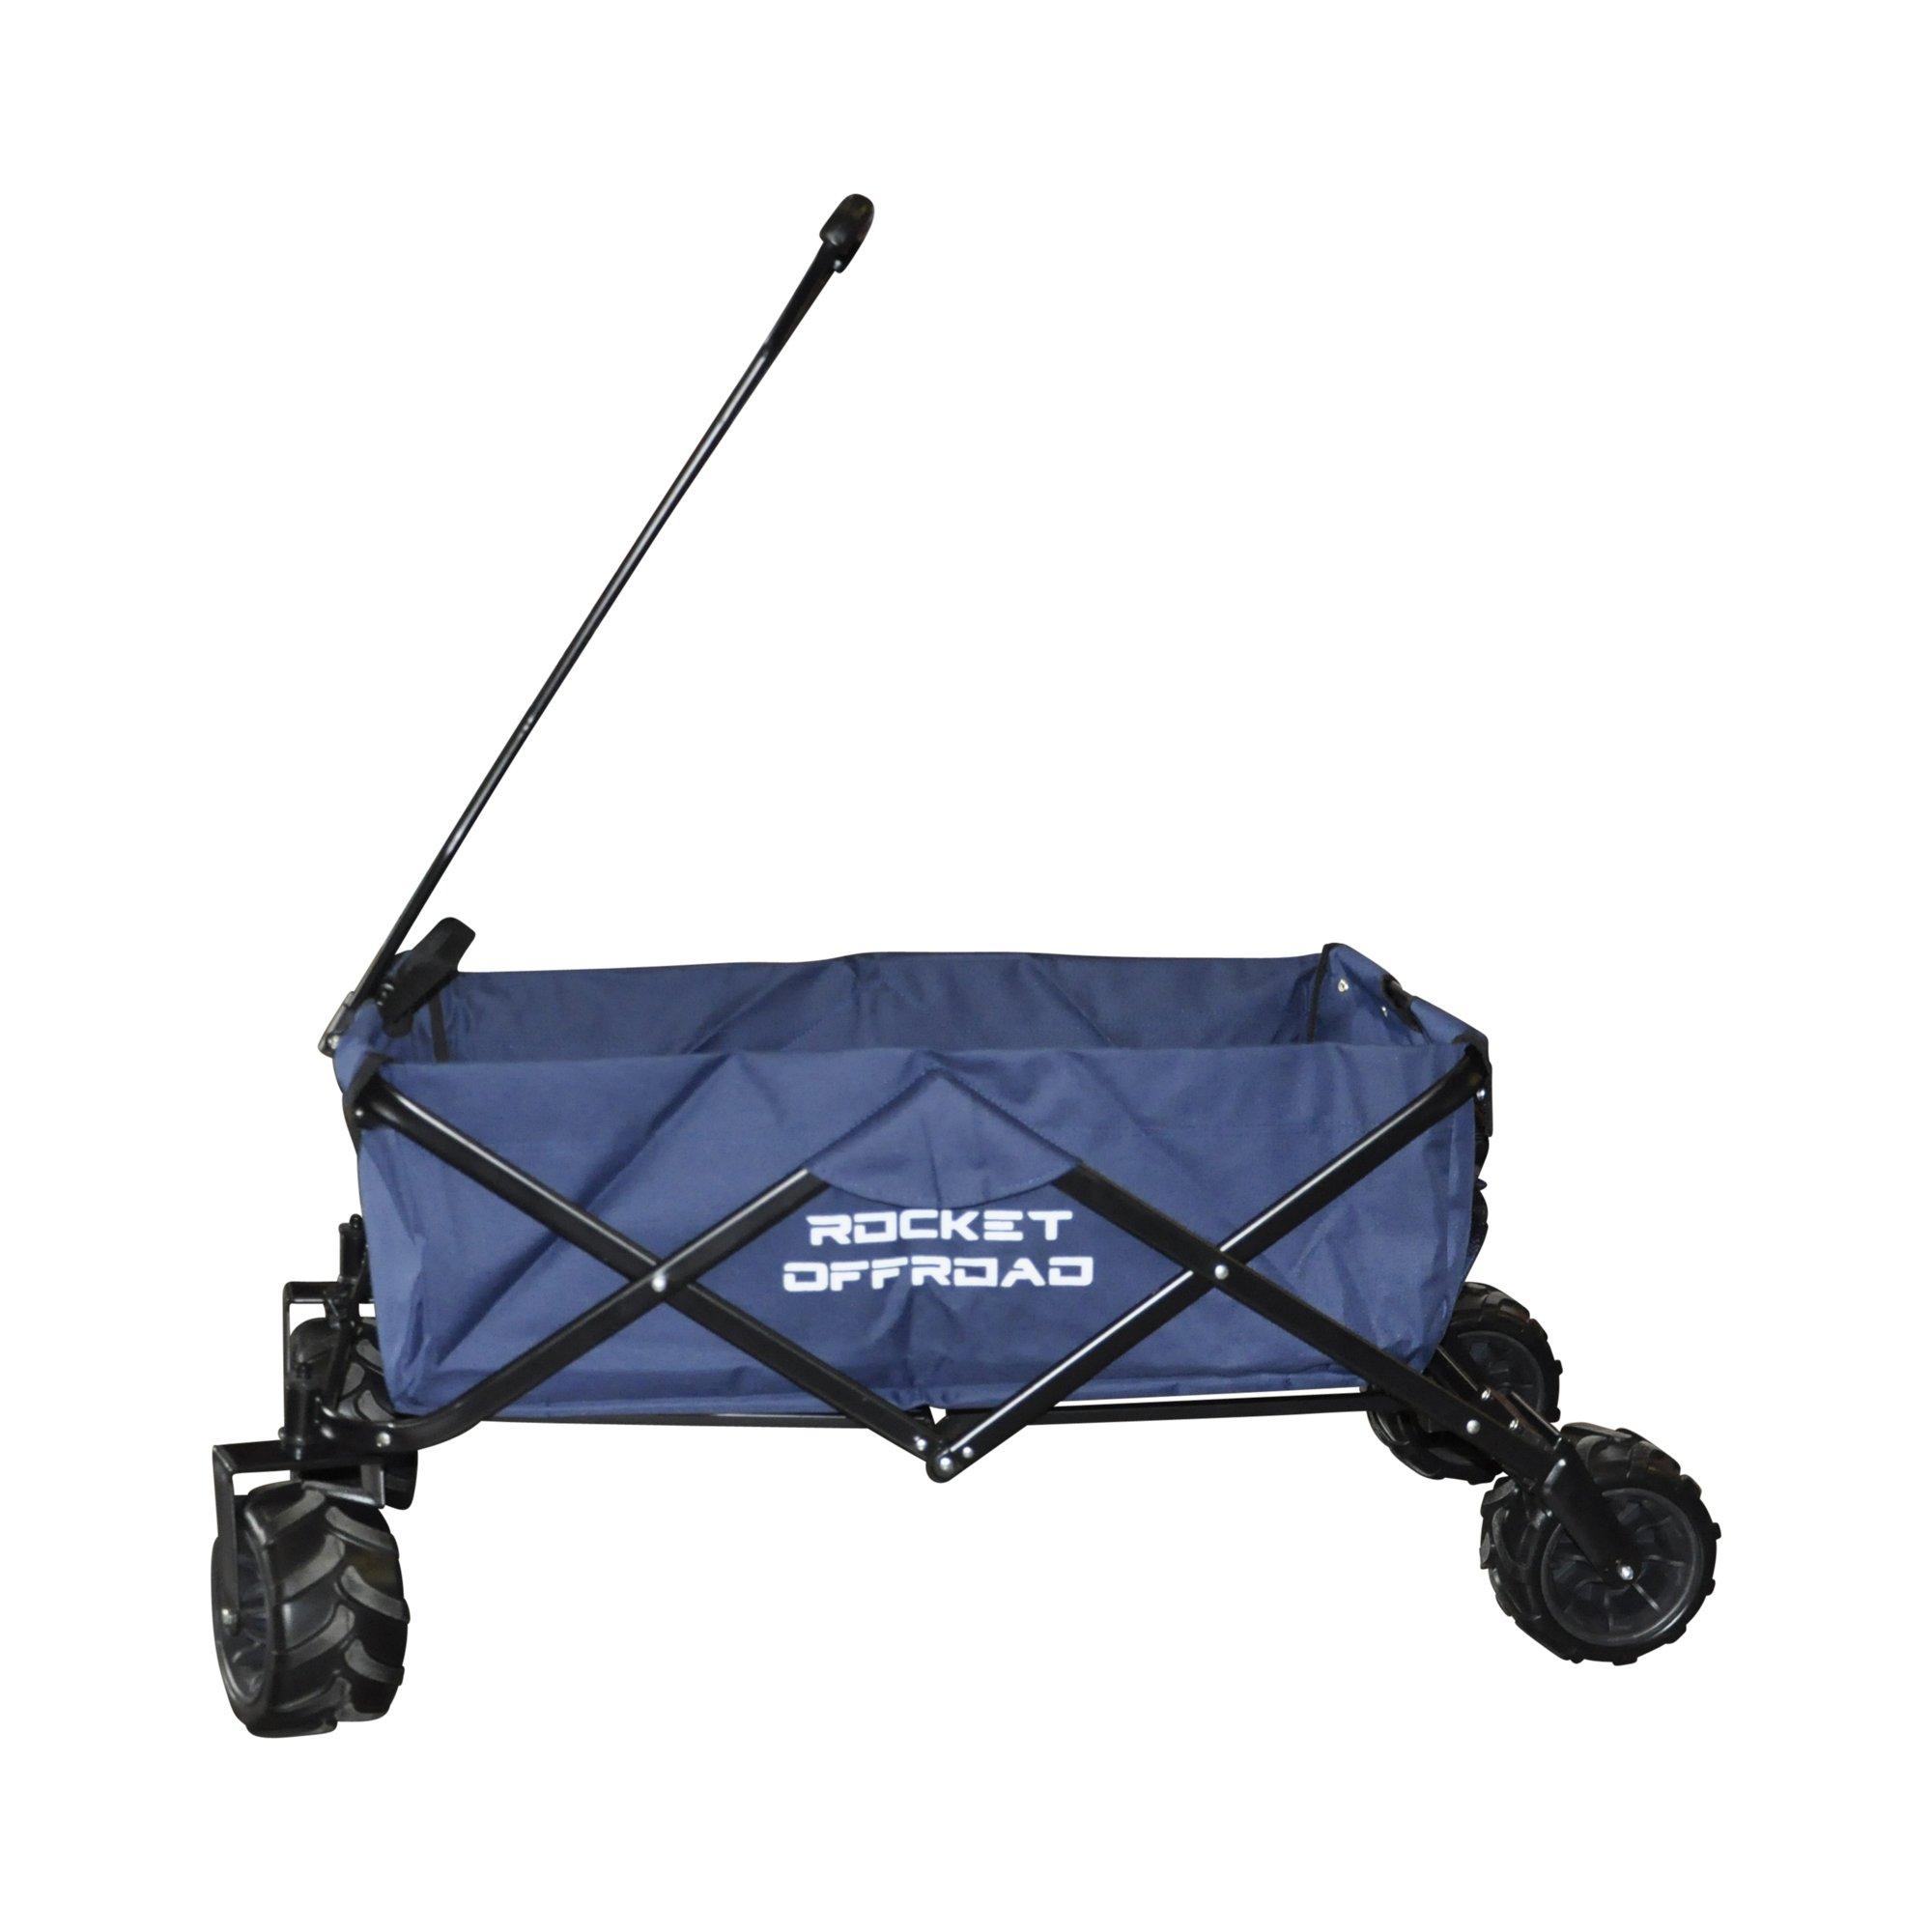 Rocket Offroad RO-UBW-BL All Terrain Collapsible Heavy Duty Folding Utility Wagon Outdoor Cart, Dark Blue